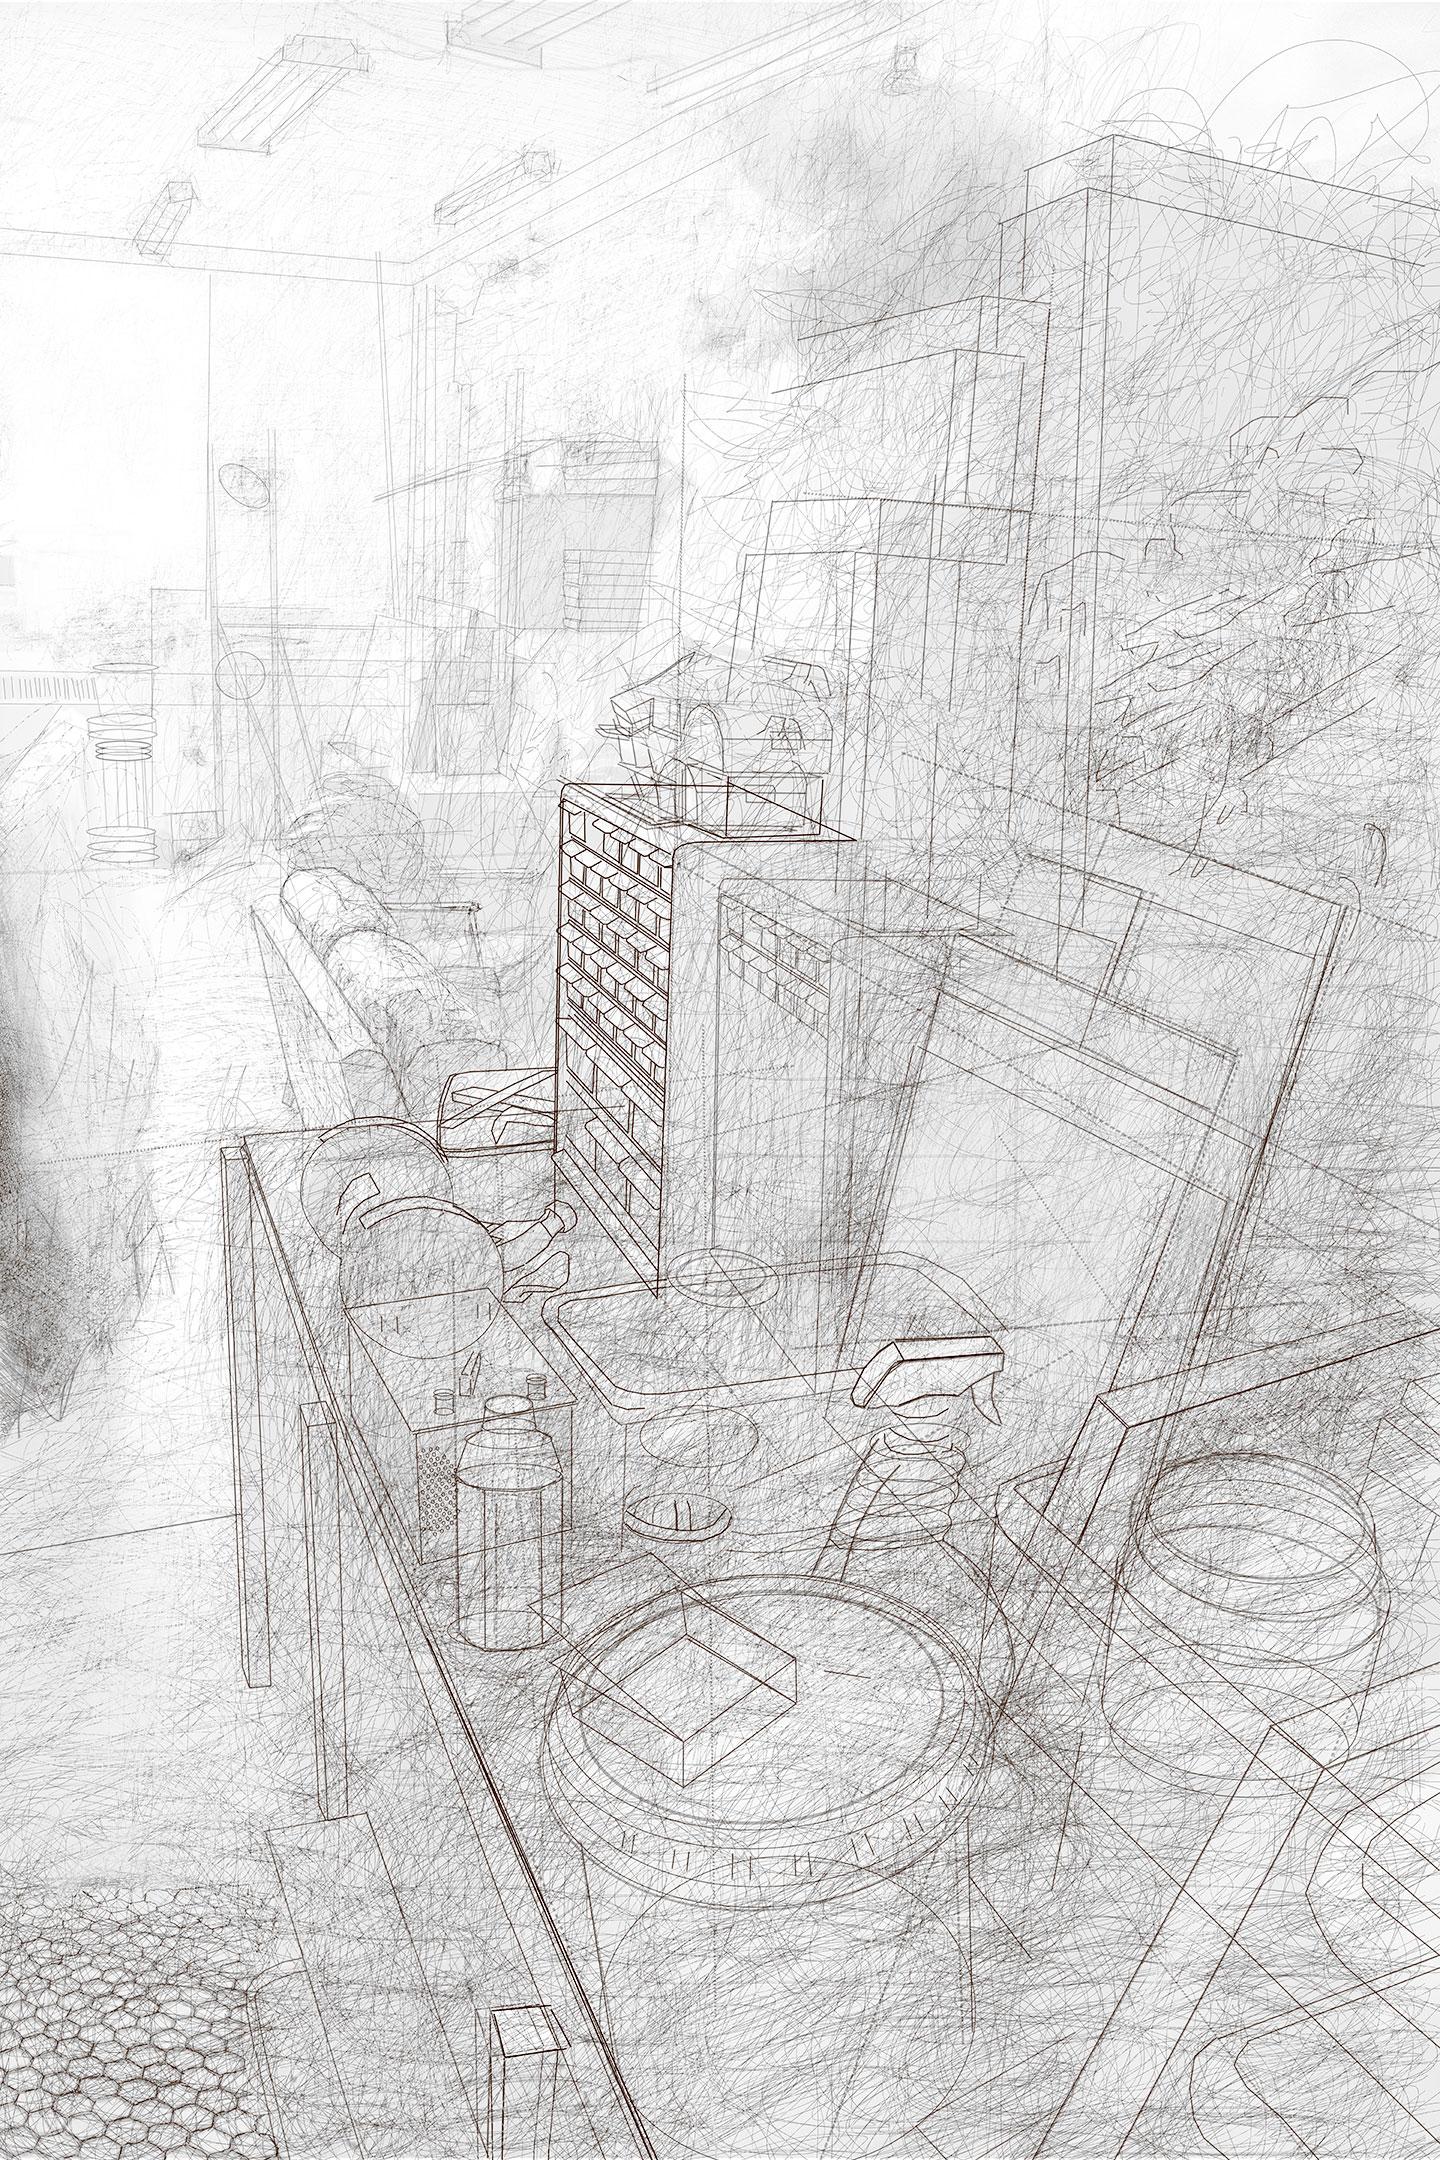 Studio_v_by_brent_holland_web